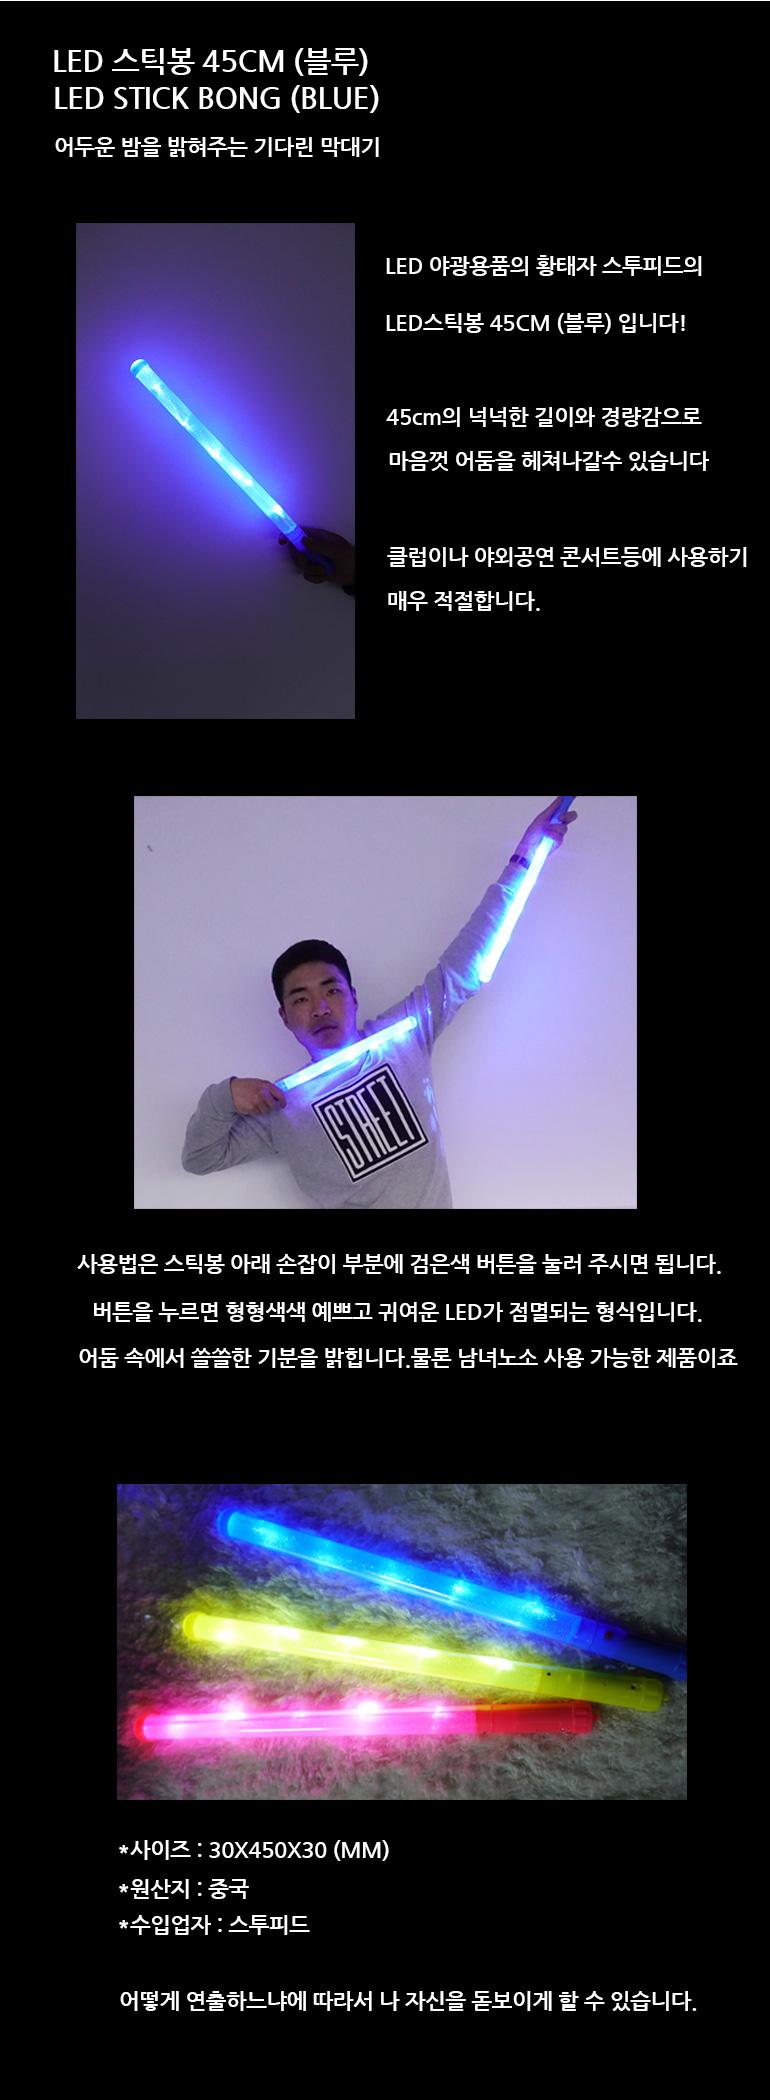 LED 스틱봉 45cm (블루) - 스투피드, 3,000원, 파티용품, 데코/장식용품